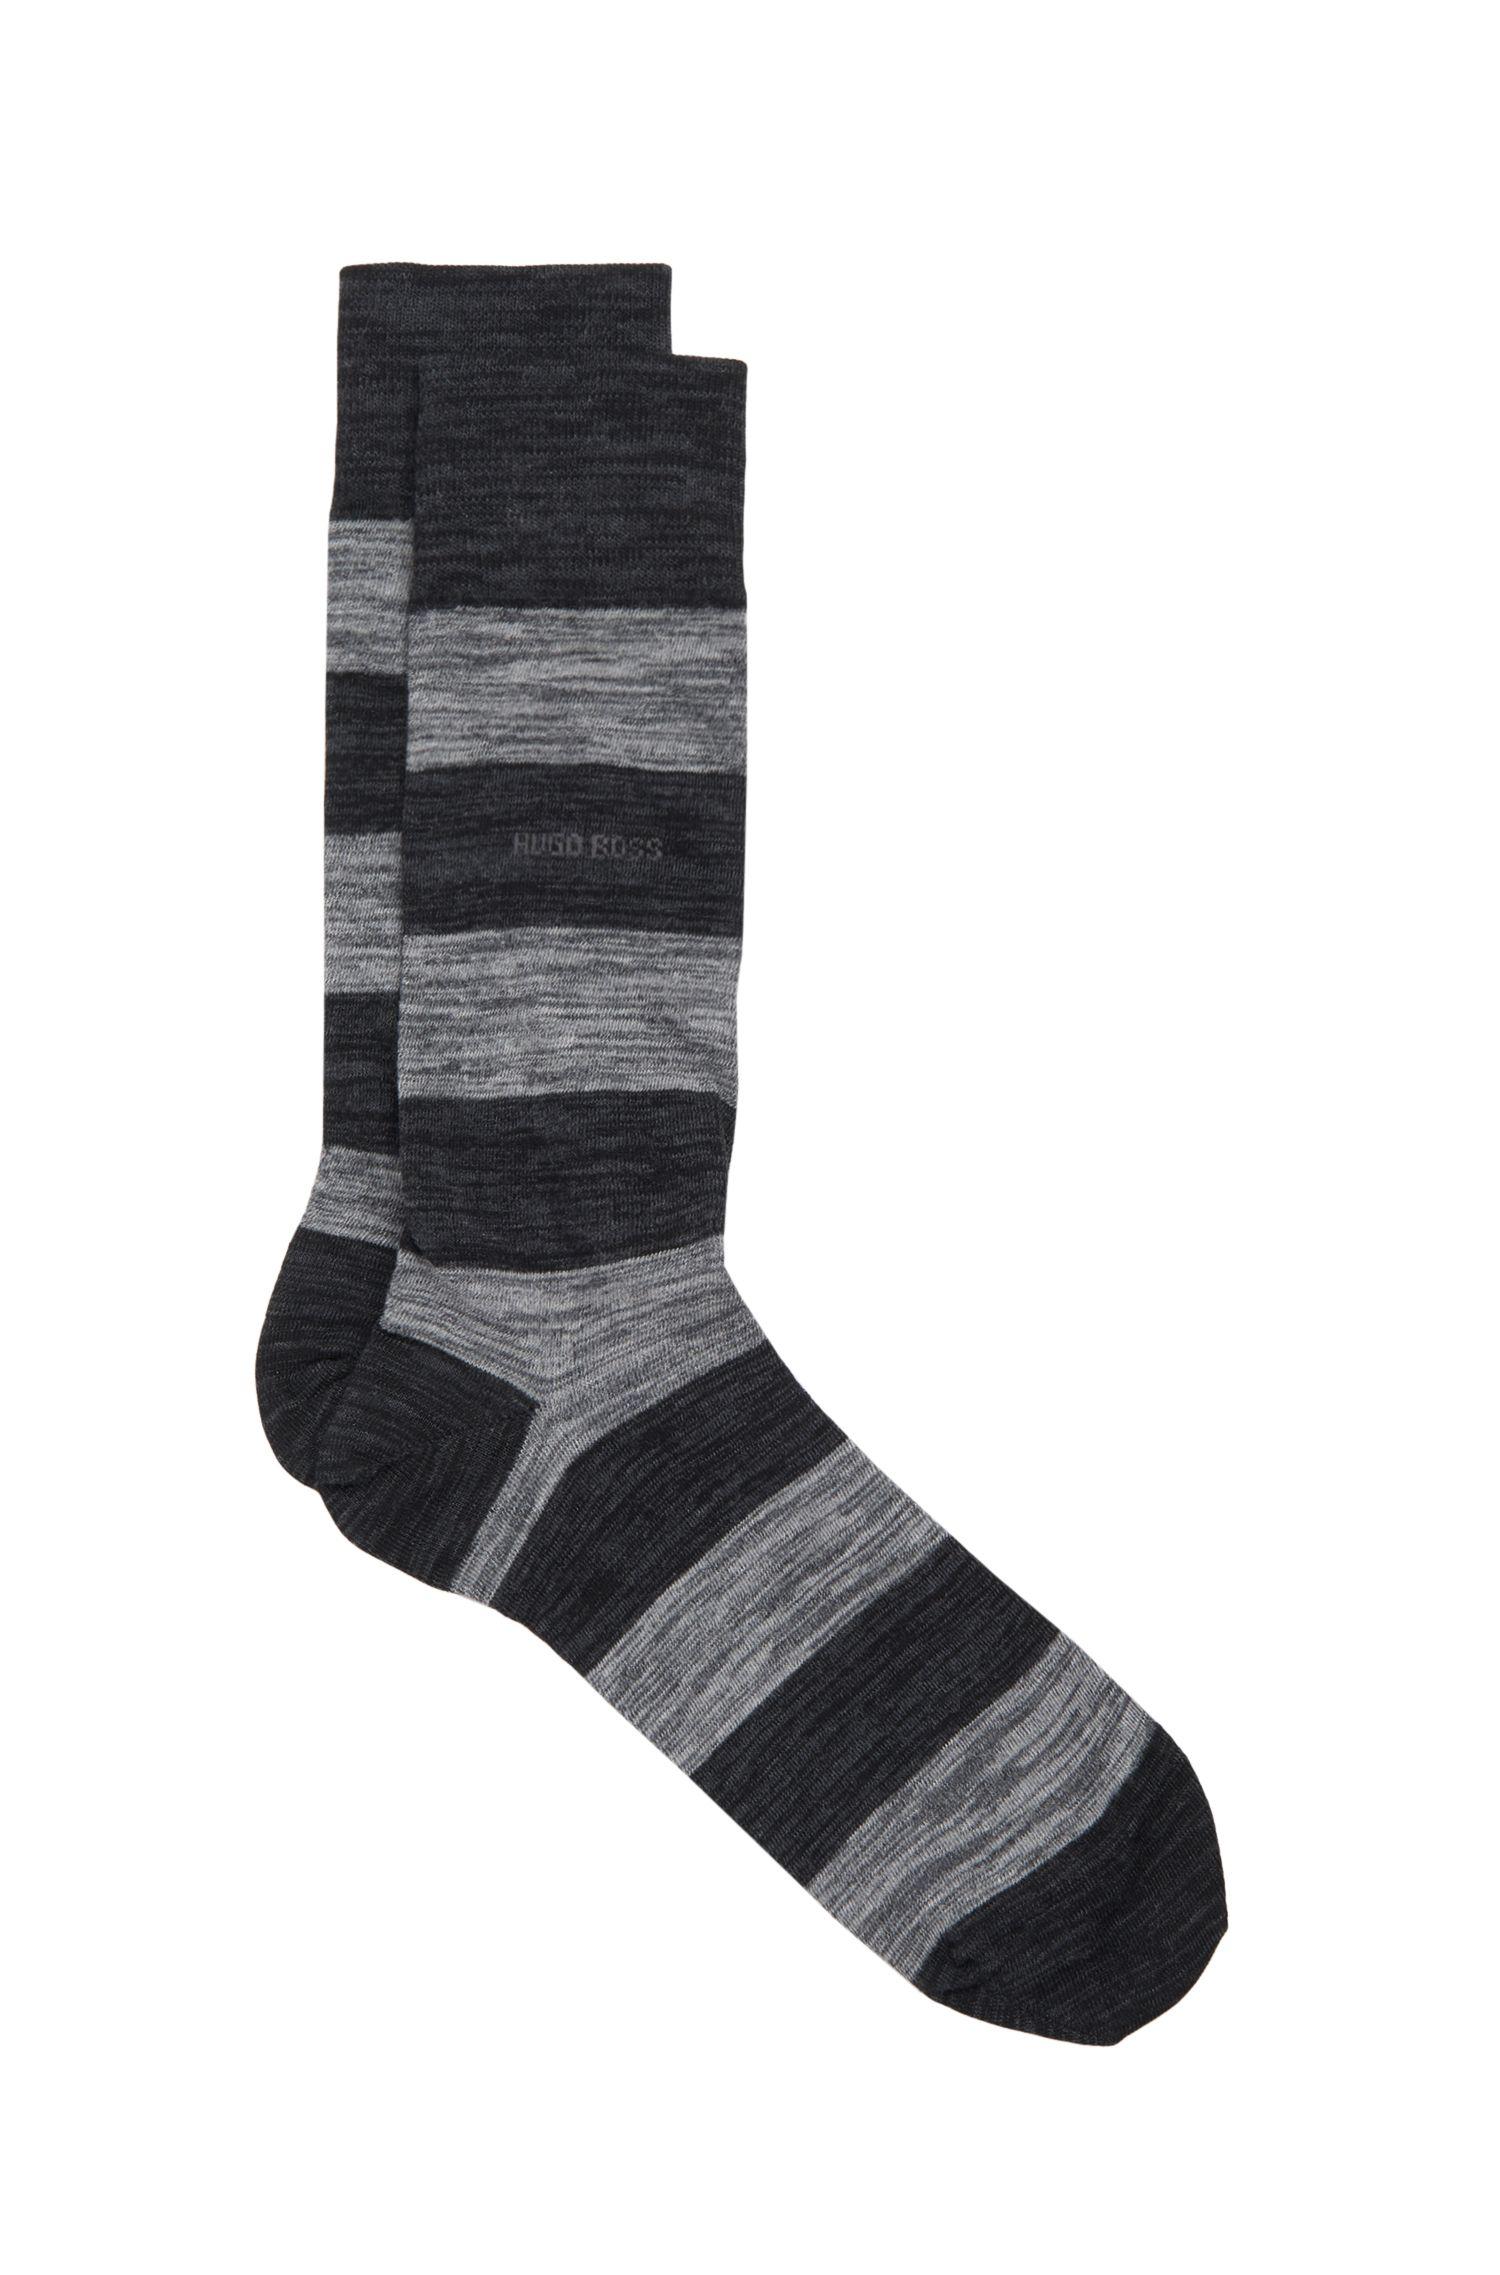 'RS Design US' | Striped Stretch Cotton Blend Socks